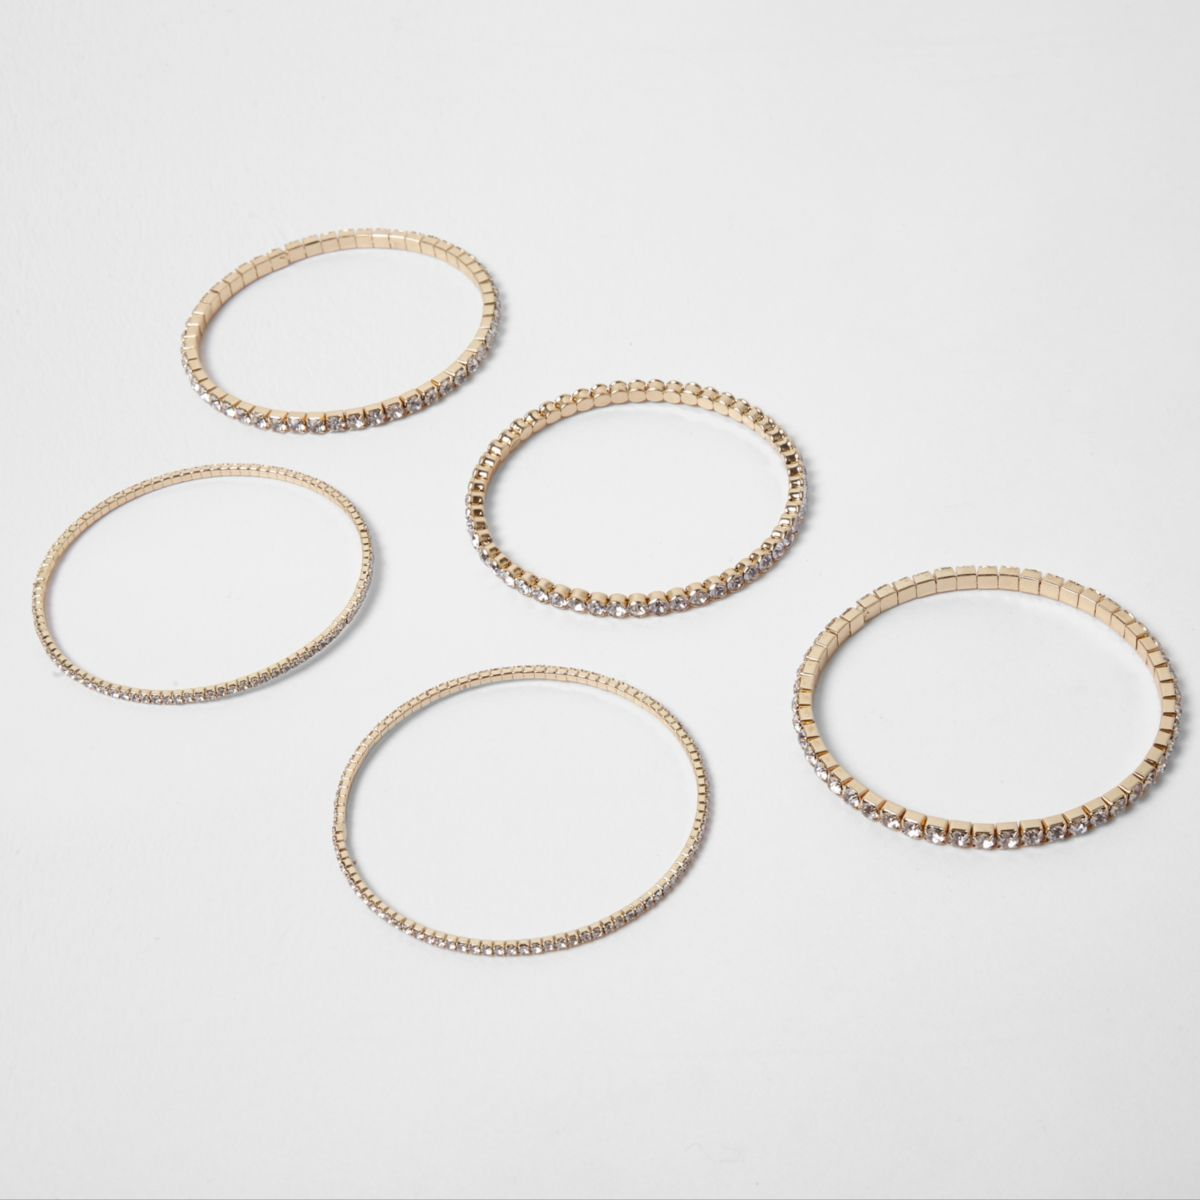 Gold tone diamante encrusted bracelet pack